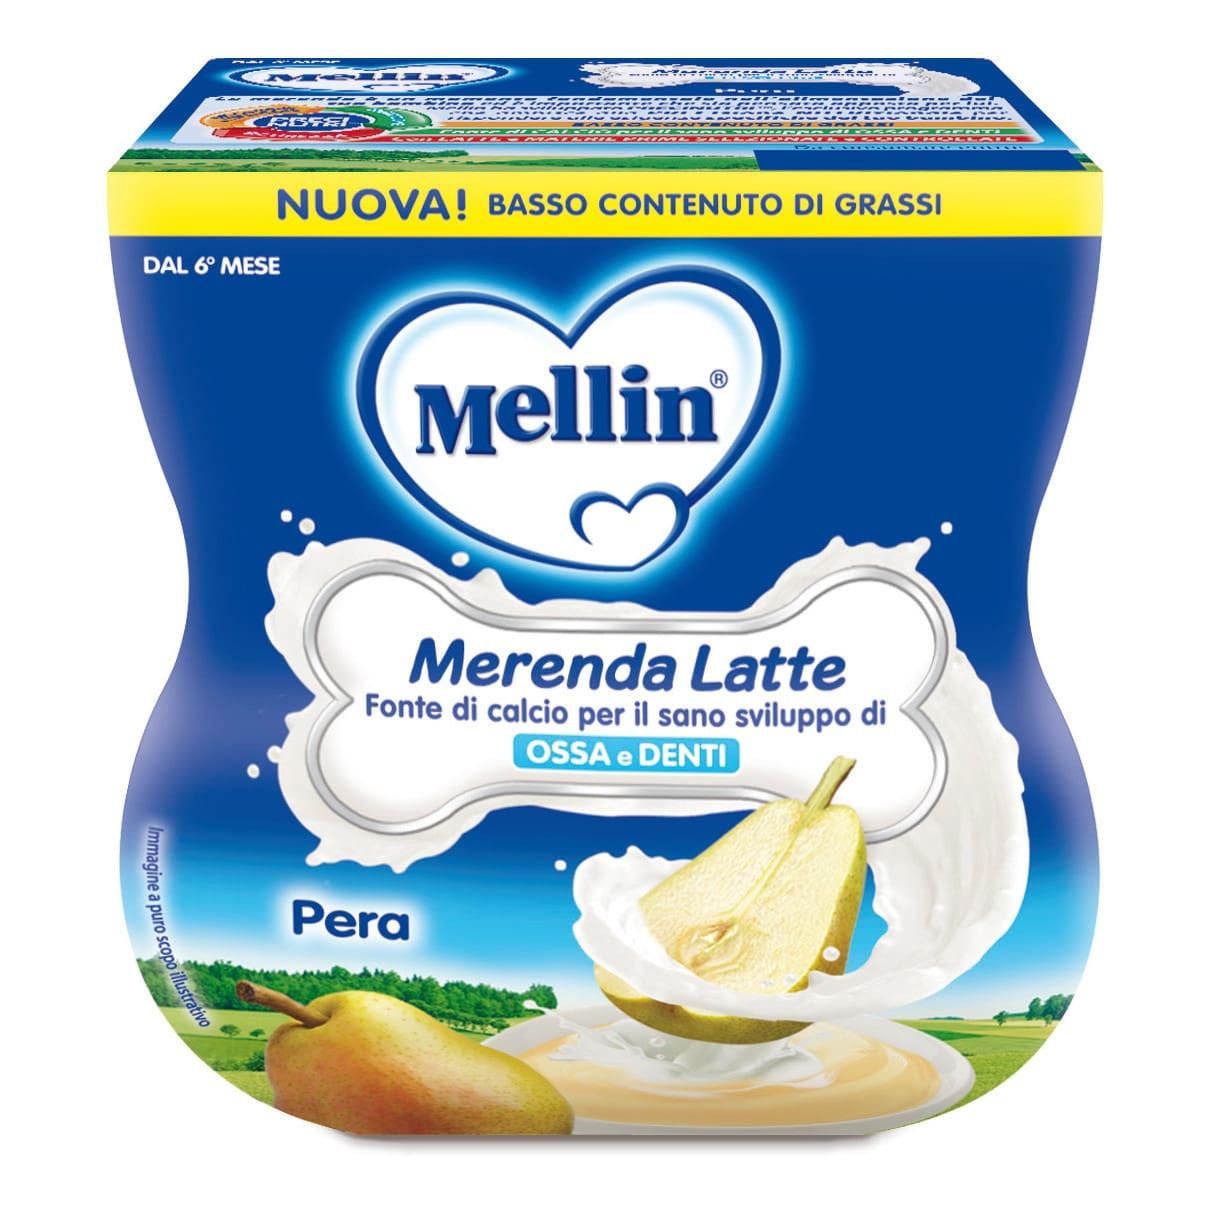 Merenda Latte e Pera Mellin